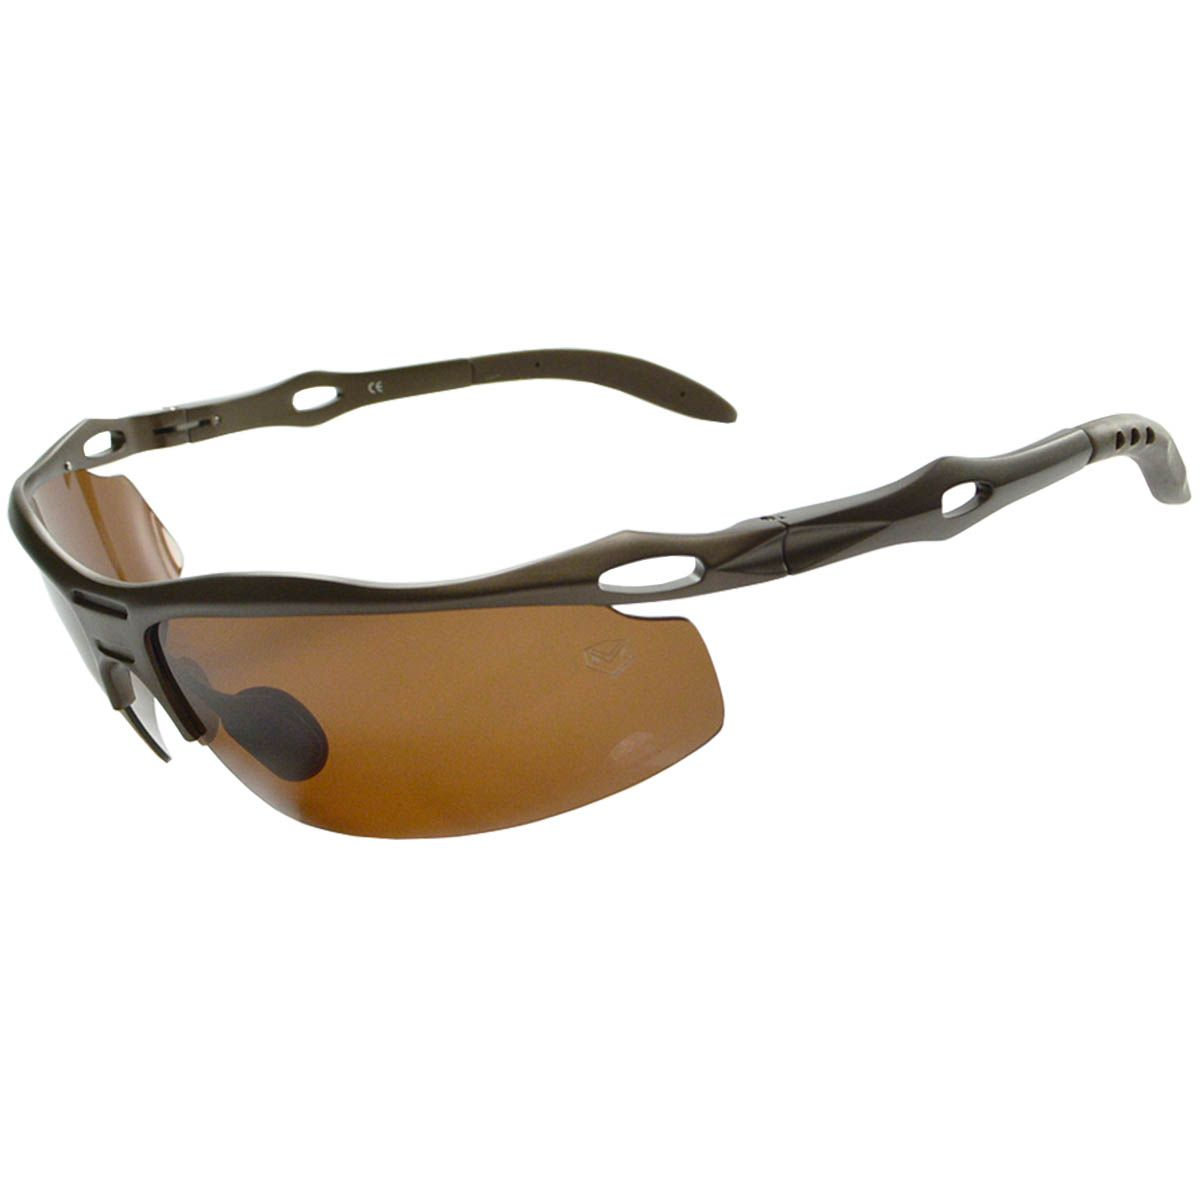 Óculos De Sol Mackage Masculino Aluminio Polarizado Retangular Esportivo - Marrom